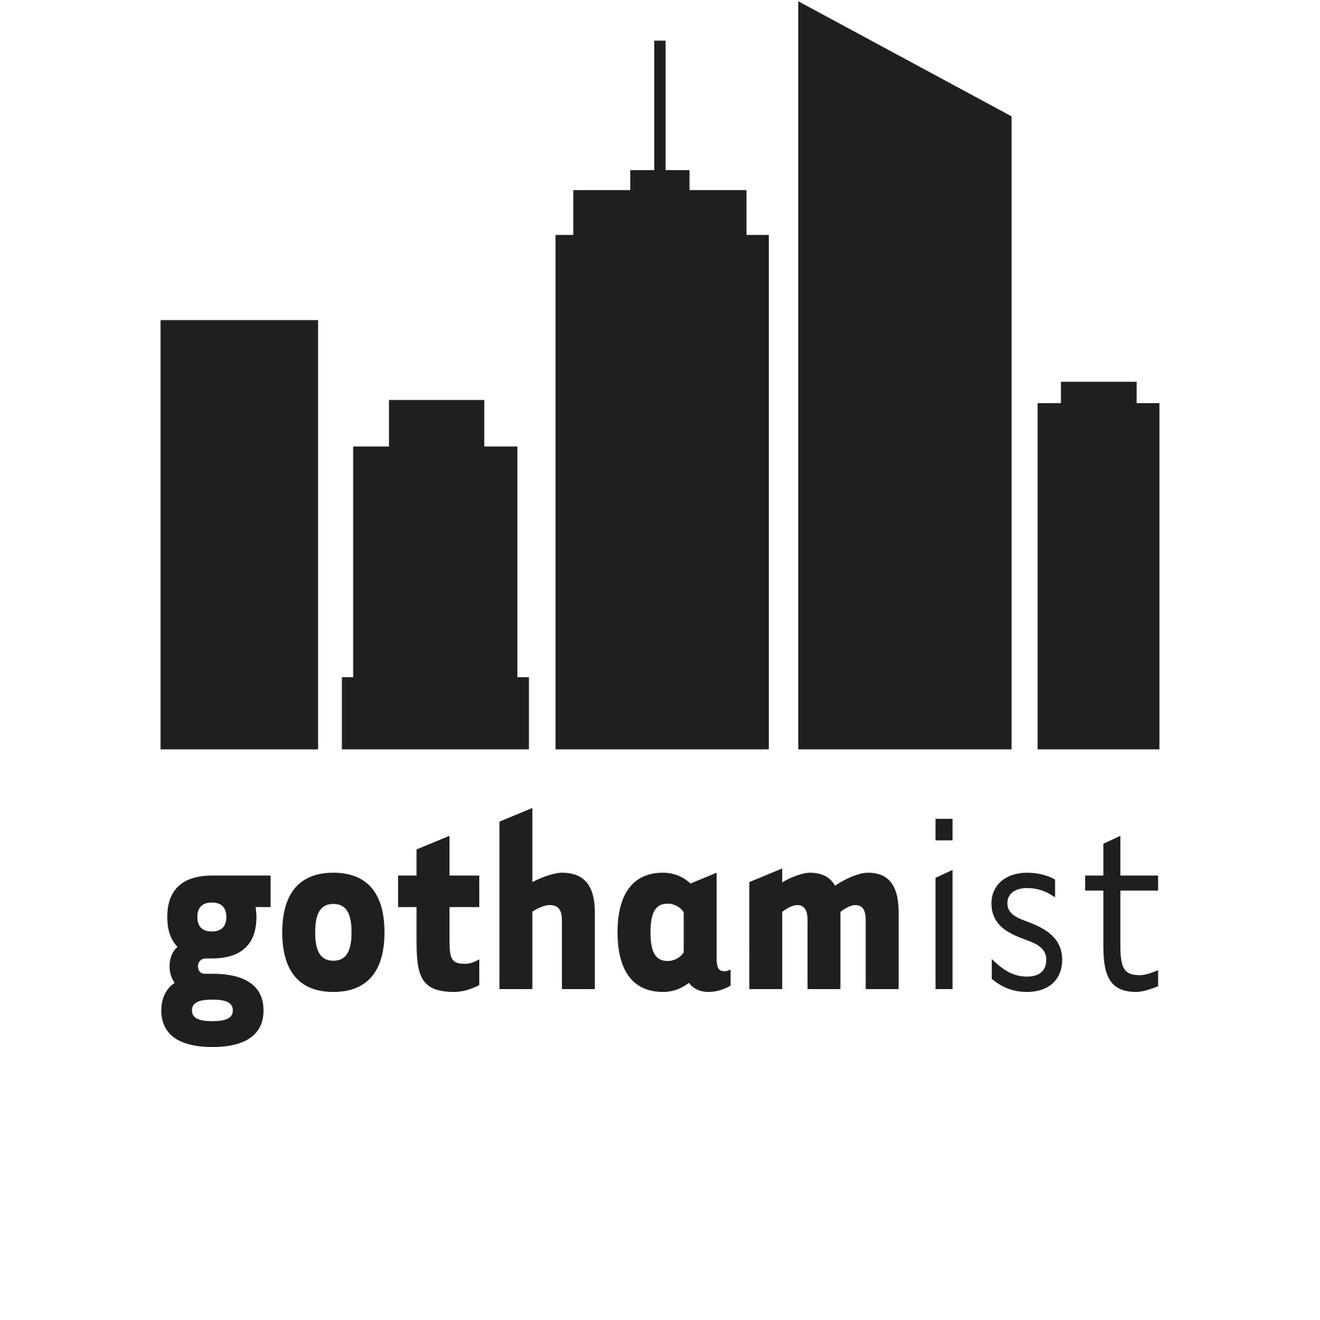 gothamist-logo.jpeg